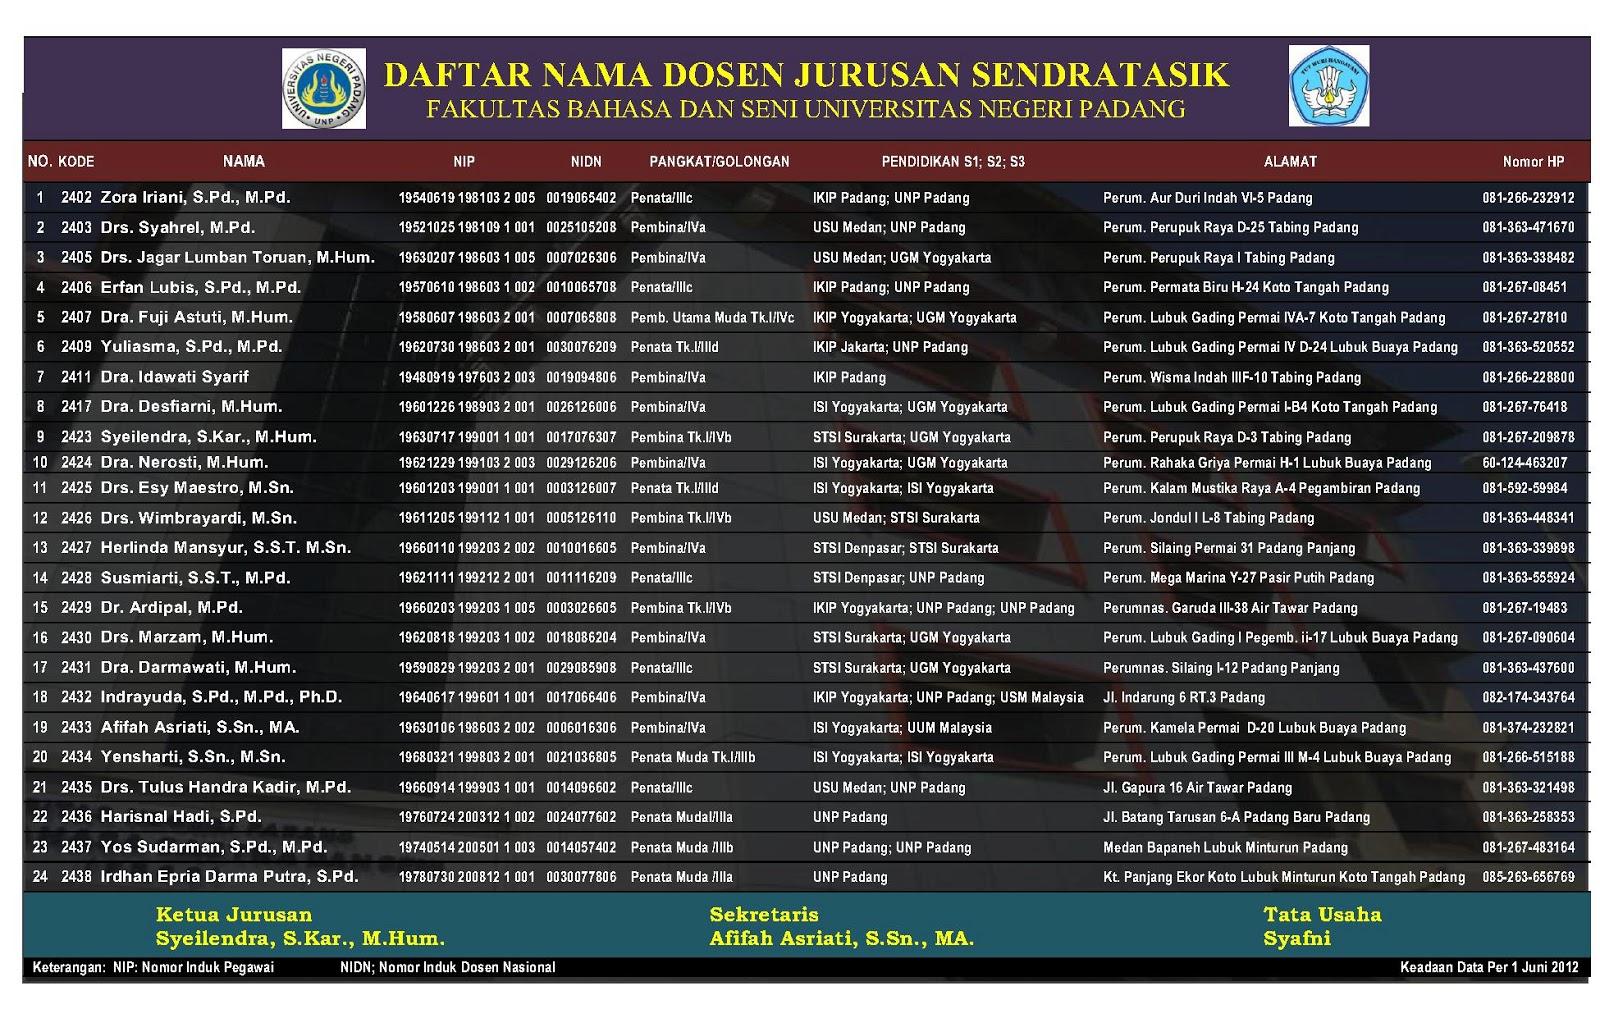 Profil Dosen Tetap Jurusan Sendratasik Fbs Unp Infosimbahmarijo